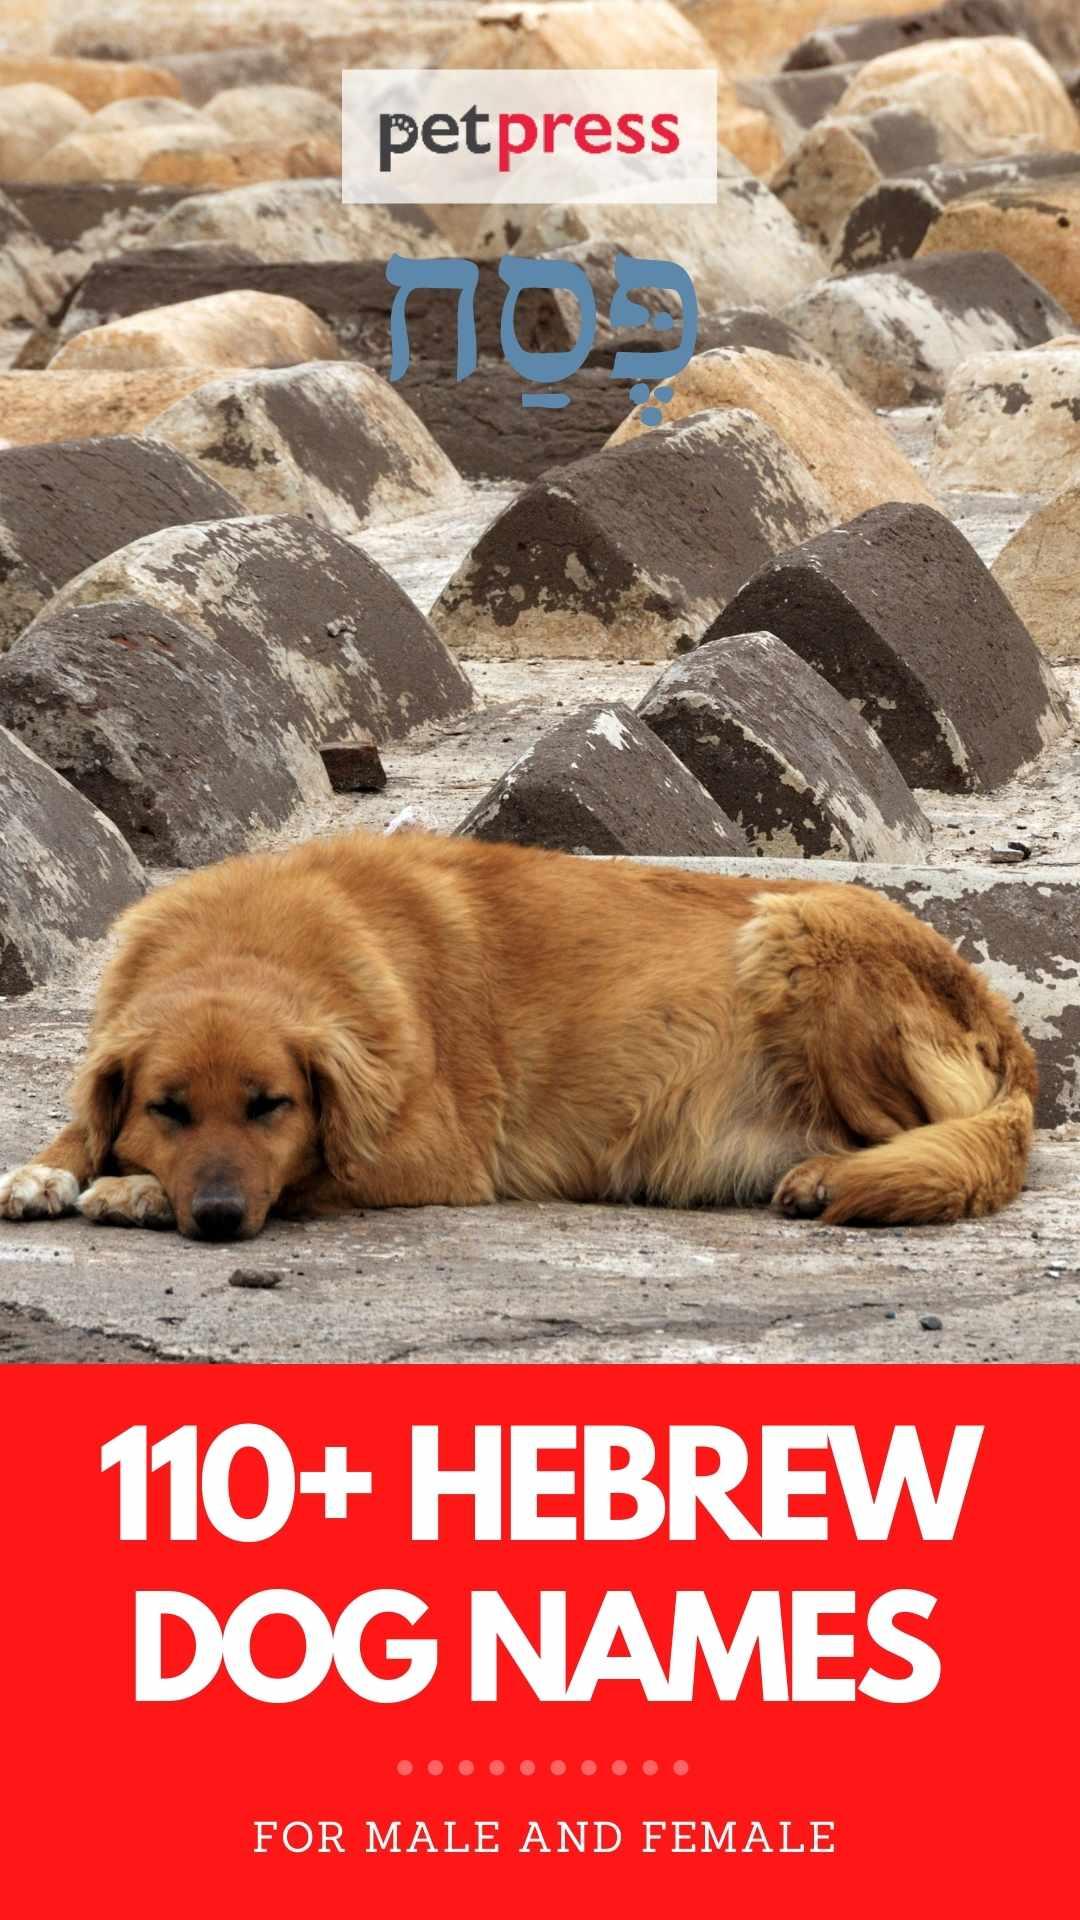 dog names in Hebrew